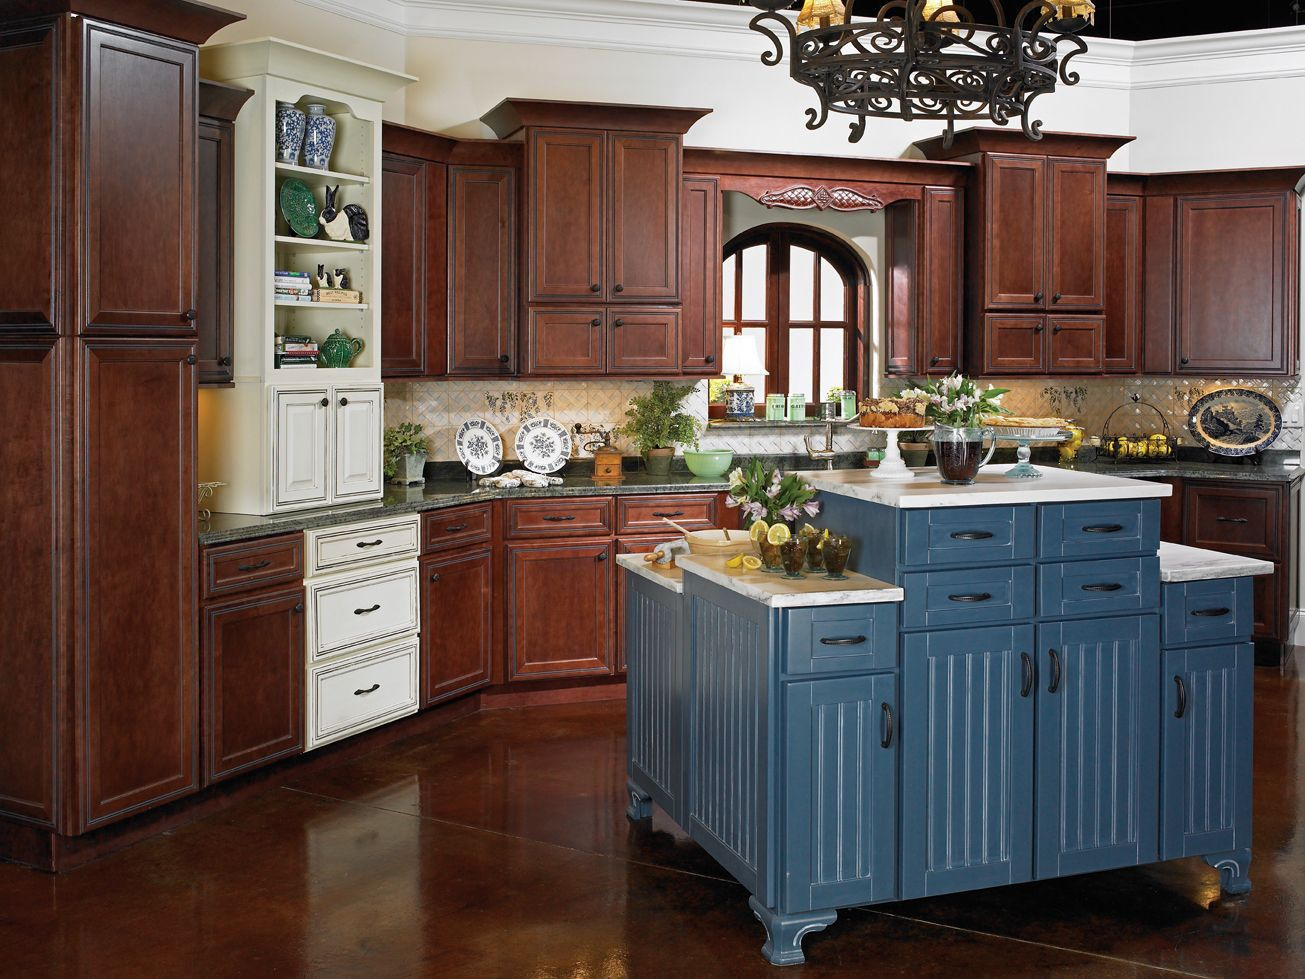 Best Kitchen Gallery: Plantation Maple Nutmeg Sterling Winter Spice Accents Kitchen of Plantation Kitchen Cabinets on rachelxblog.com